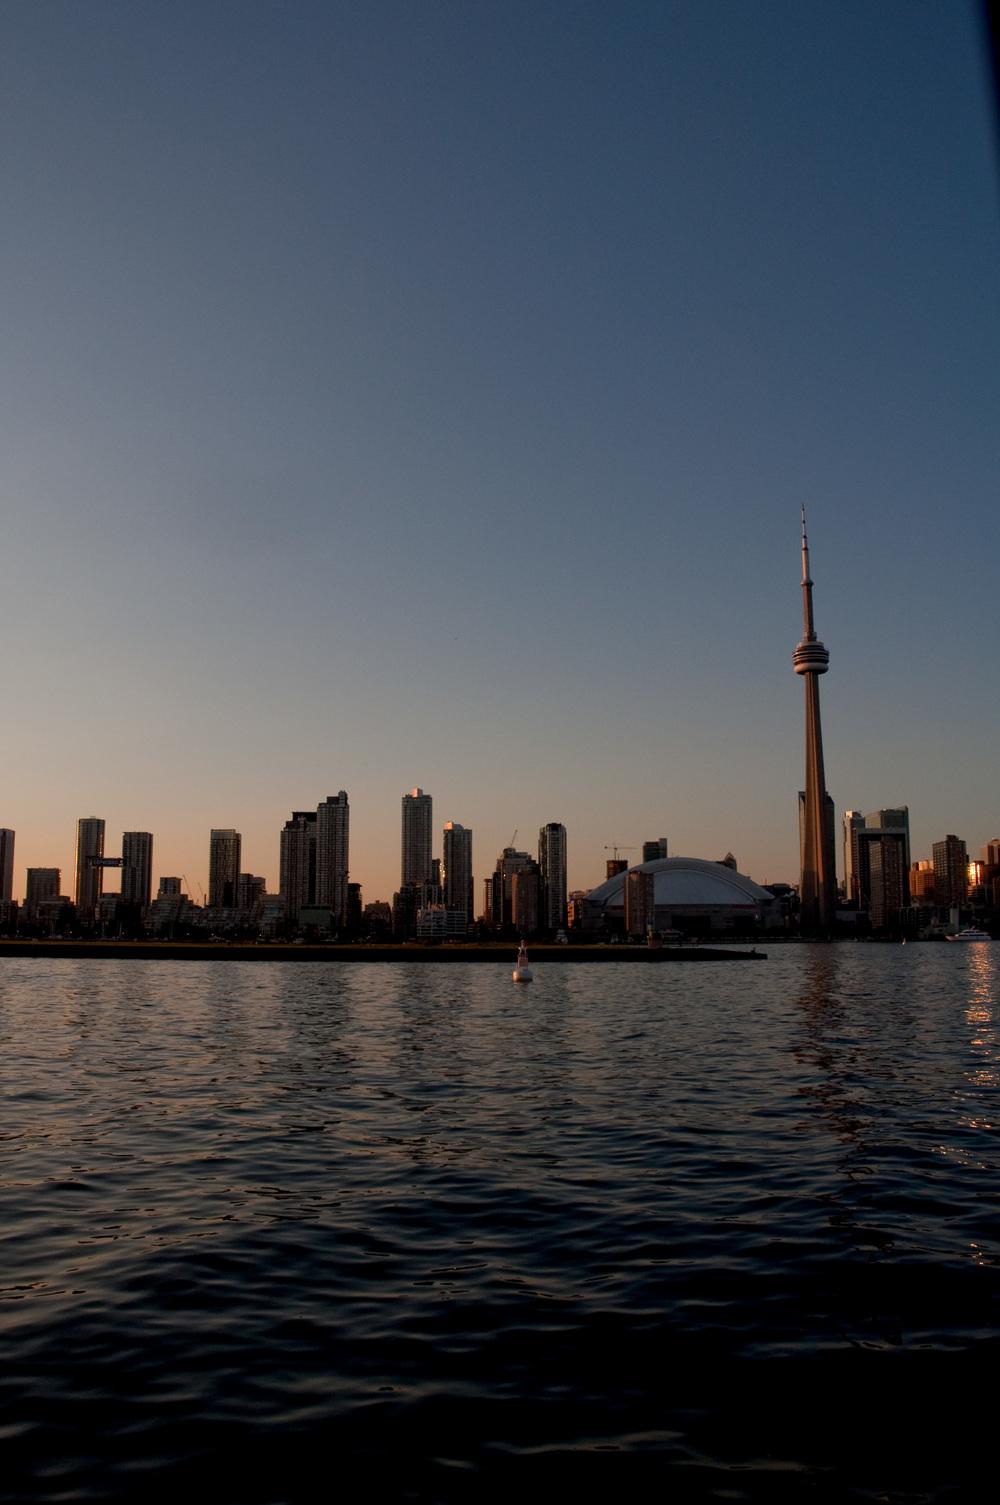 TorontoIsland2012_9674_BW.jpg